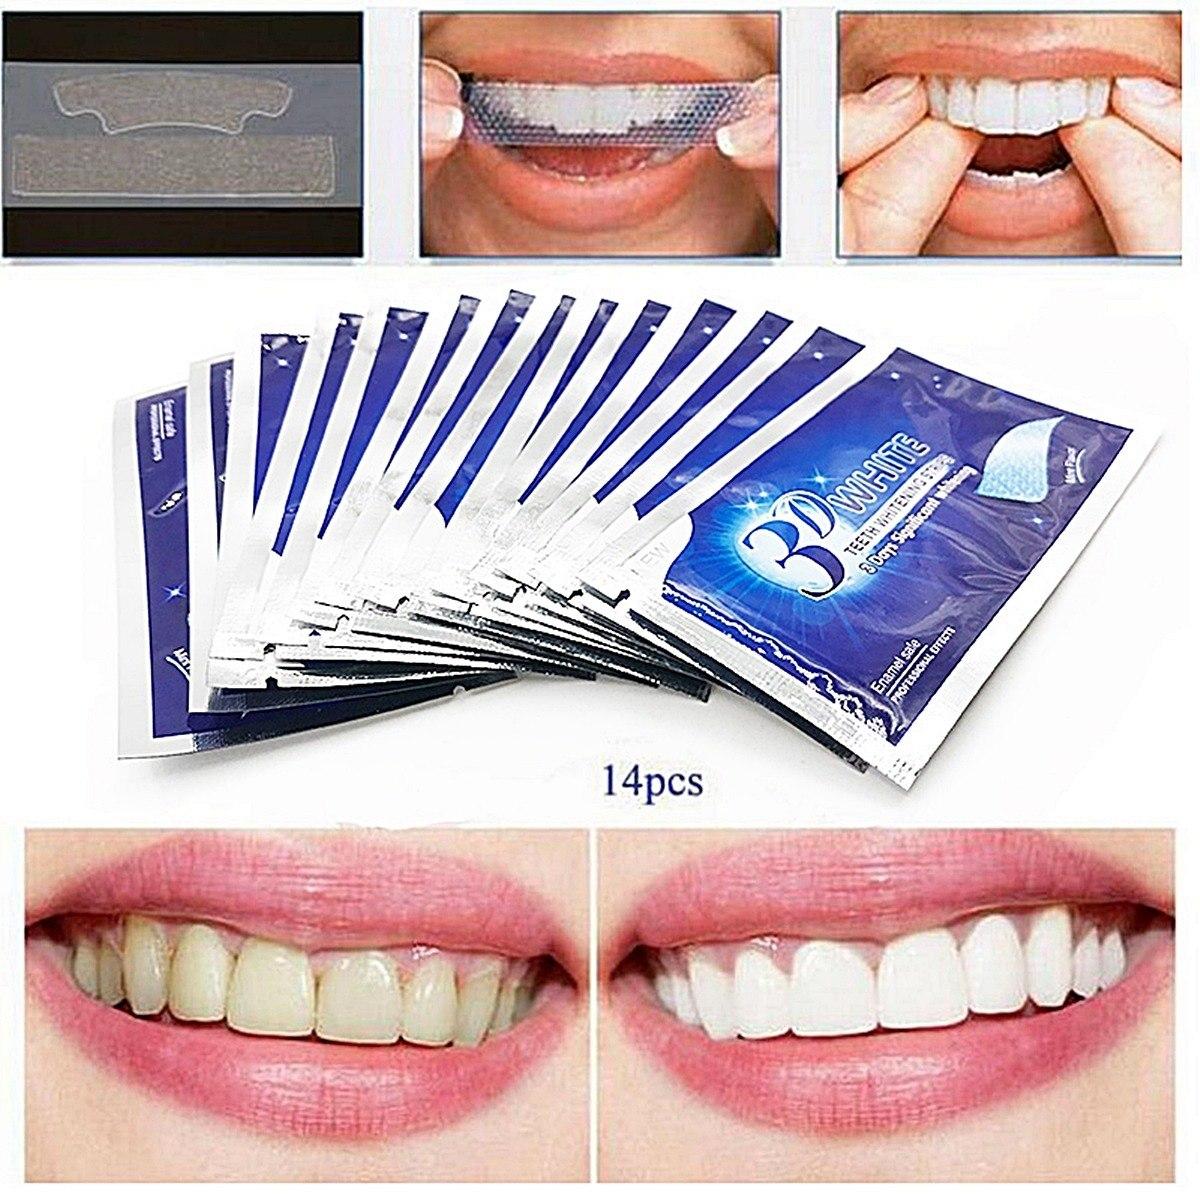 Clareamento Dental Em Fitas De Gel Adesivas Advanced Teeth R 44